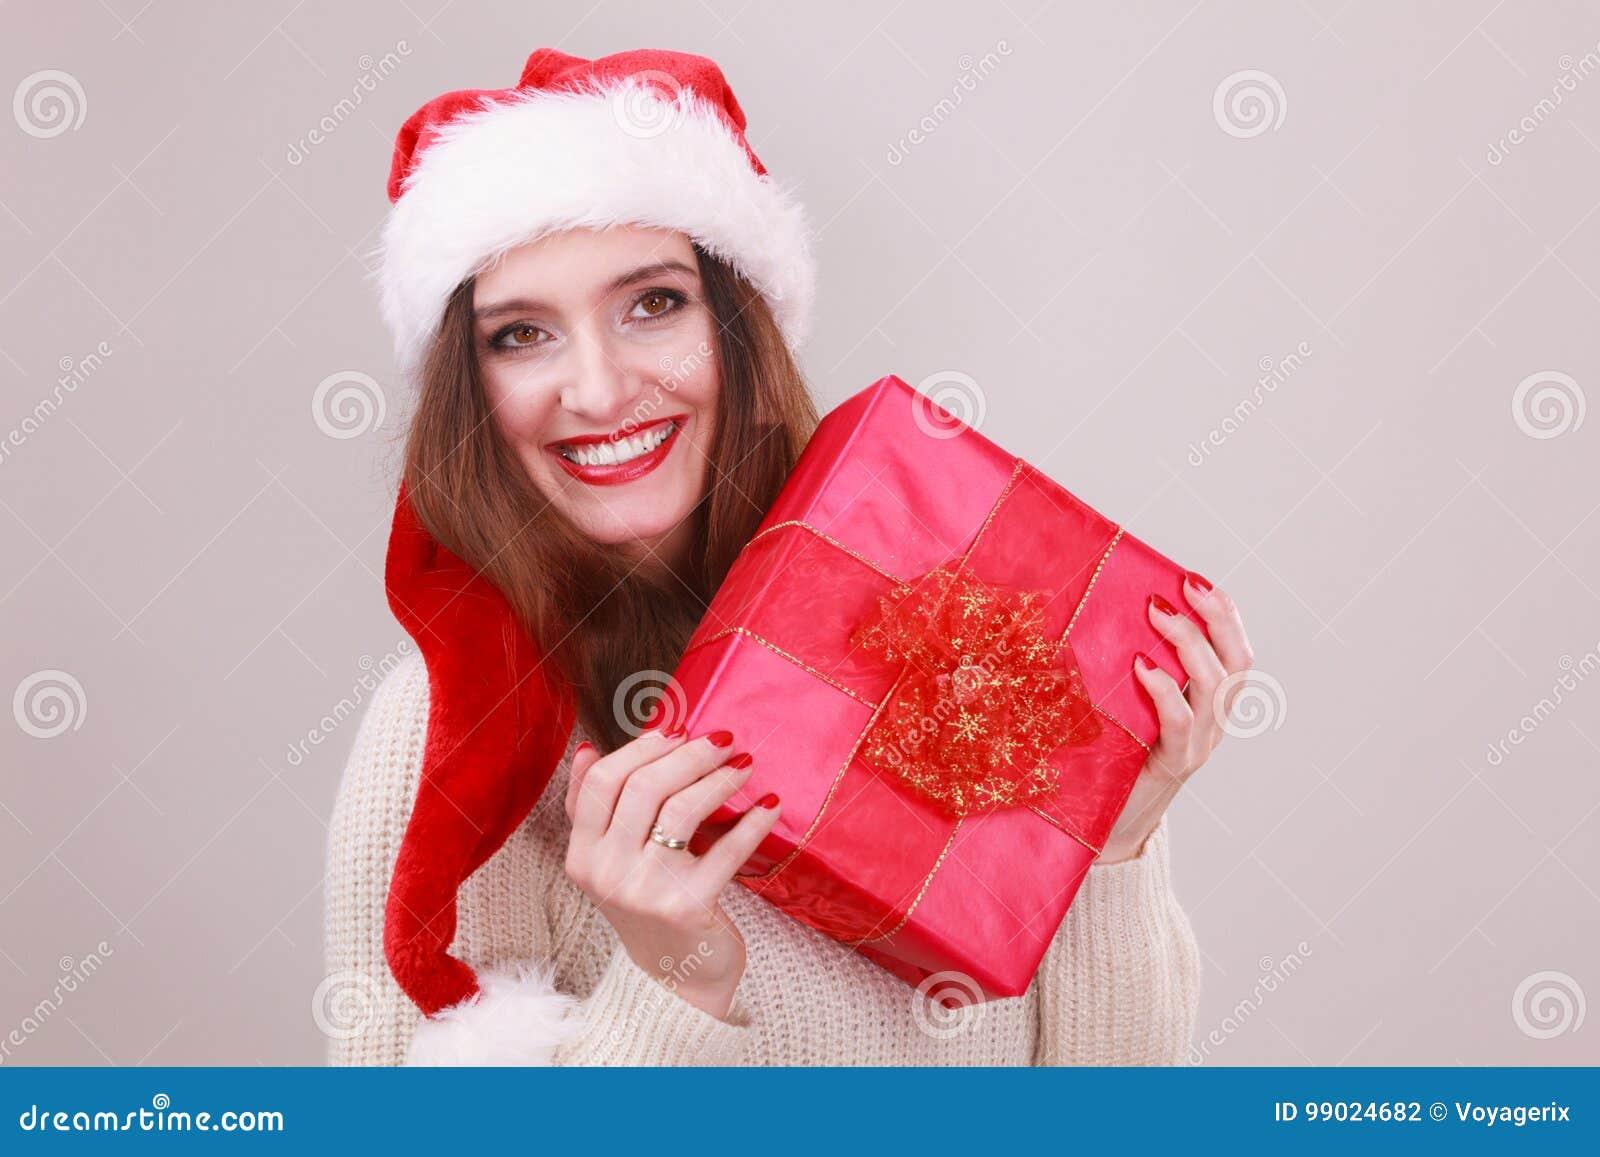 bb699b24c4f8f Gorgeous woman wearing santa claus hat holding red big gift box with  ribbon. Xmas